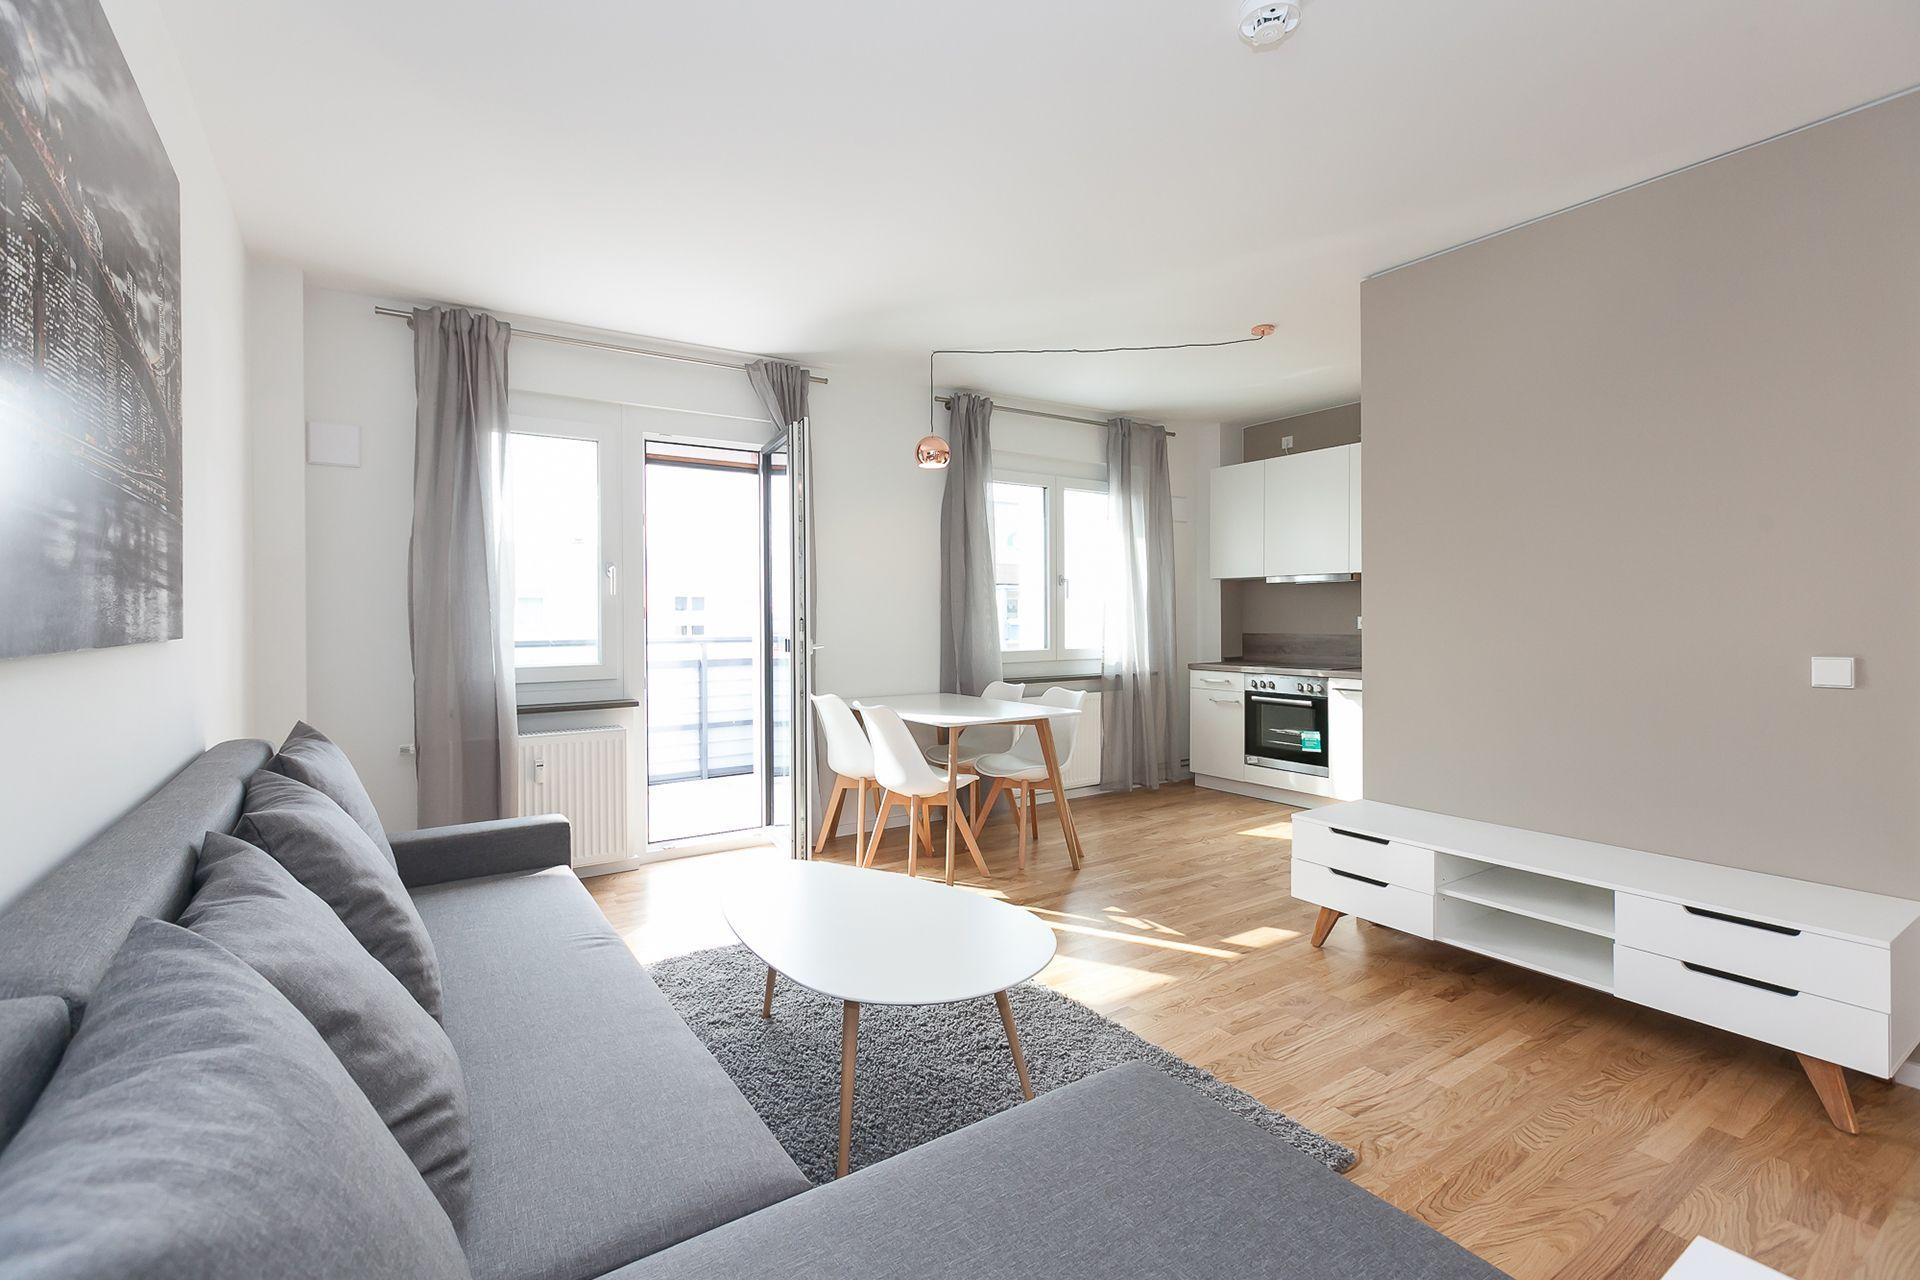 2 Bedroom - Medium apartment to rent in Berlin KOEP-KOEP-0507-0